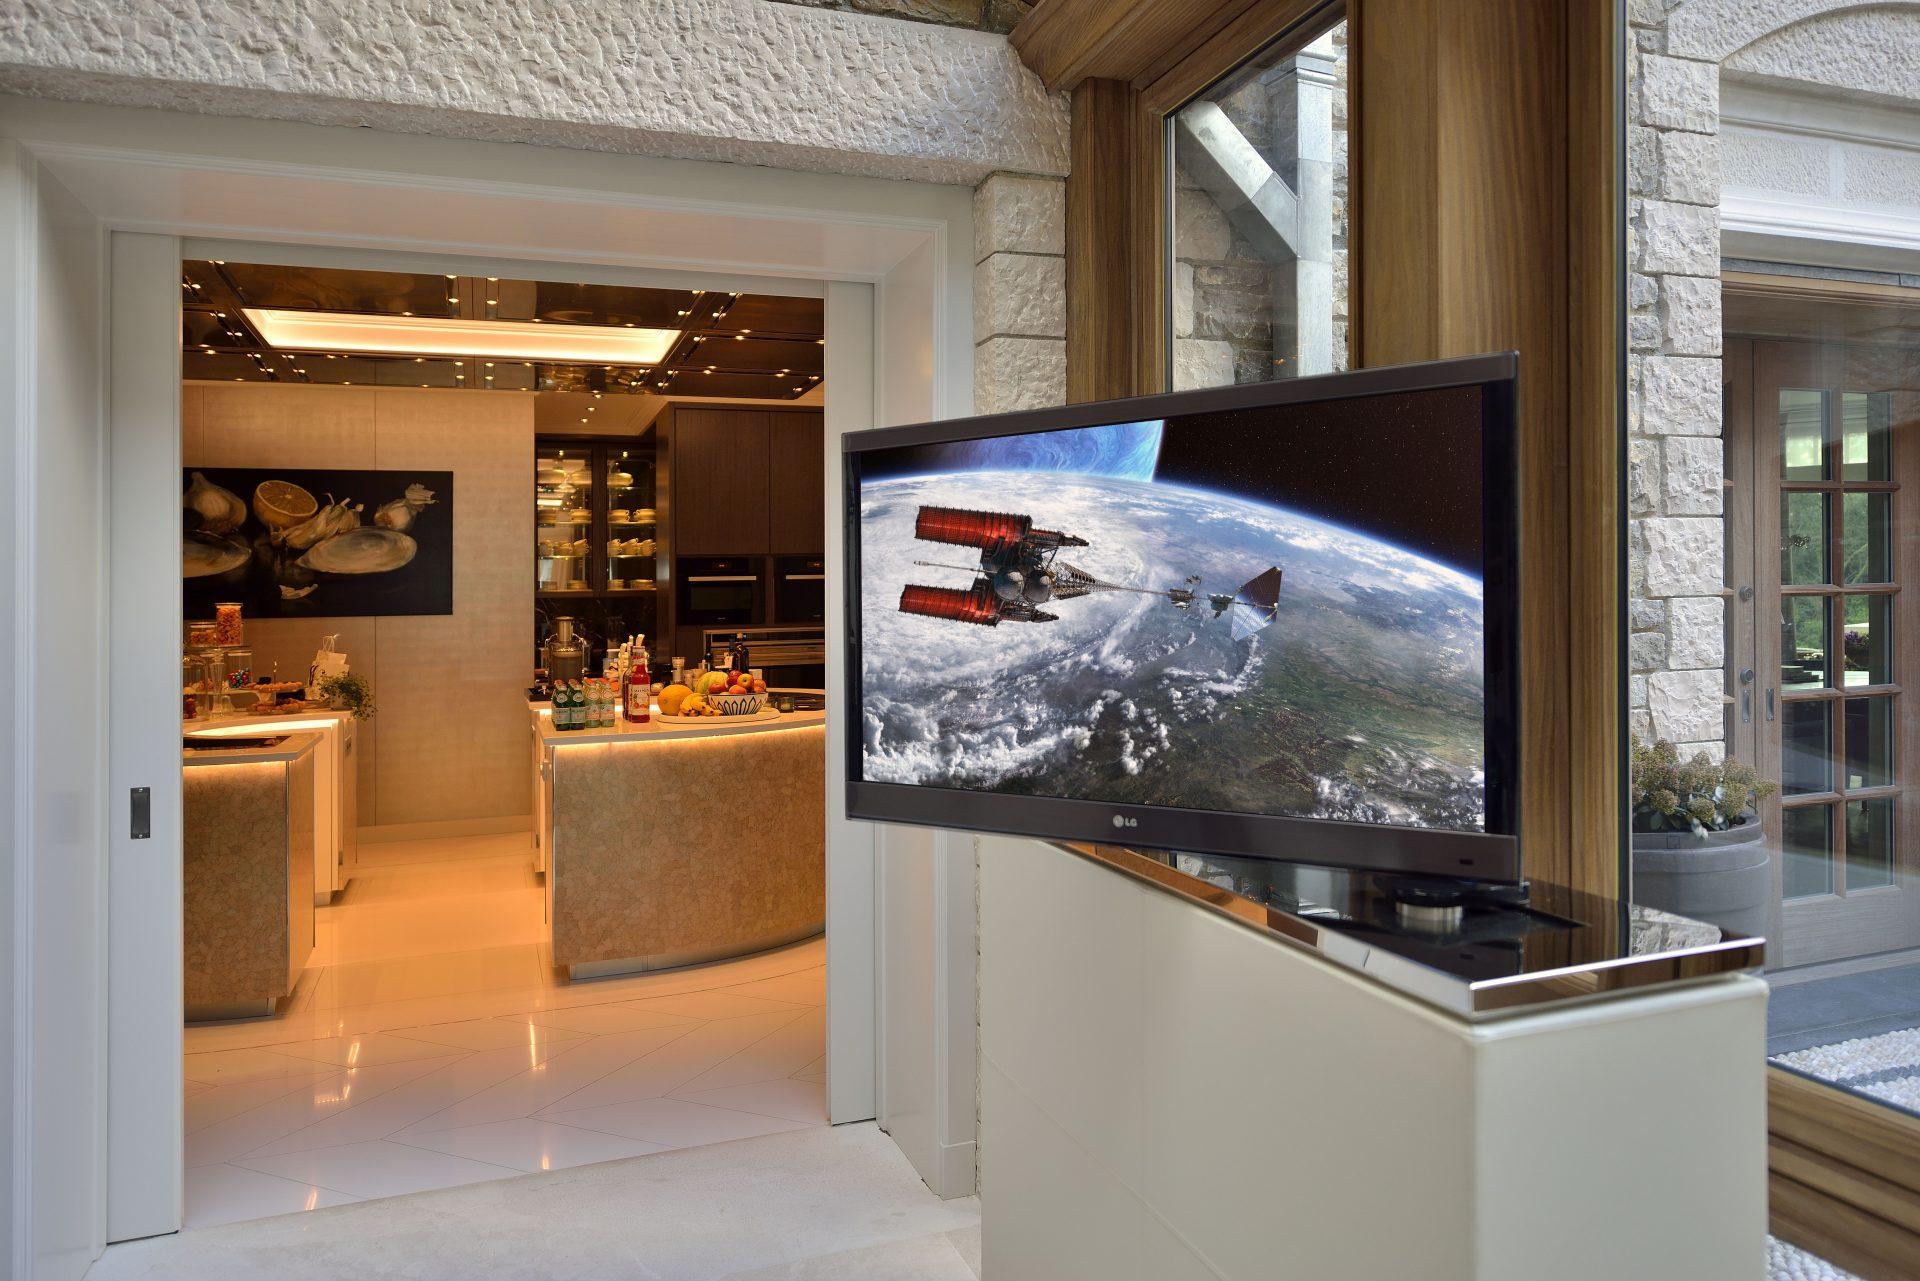 domotica multiroom video